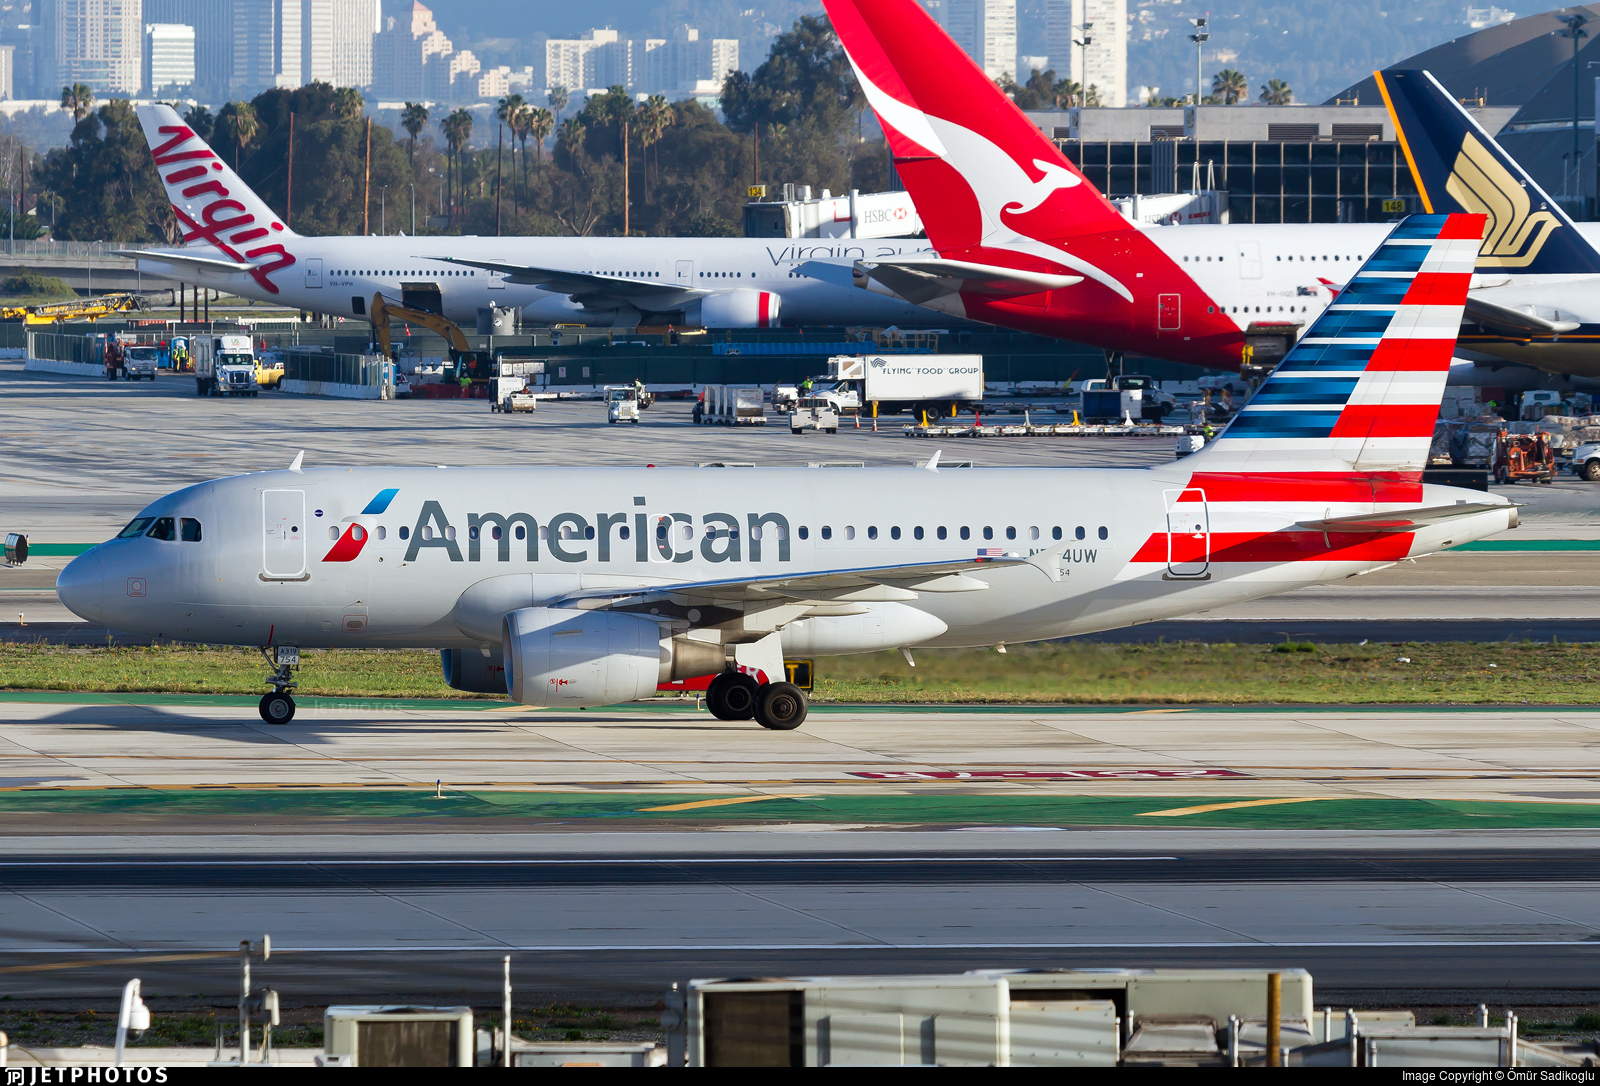 N754uw Airbus A319 112 American Airlines 214 M 252 R